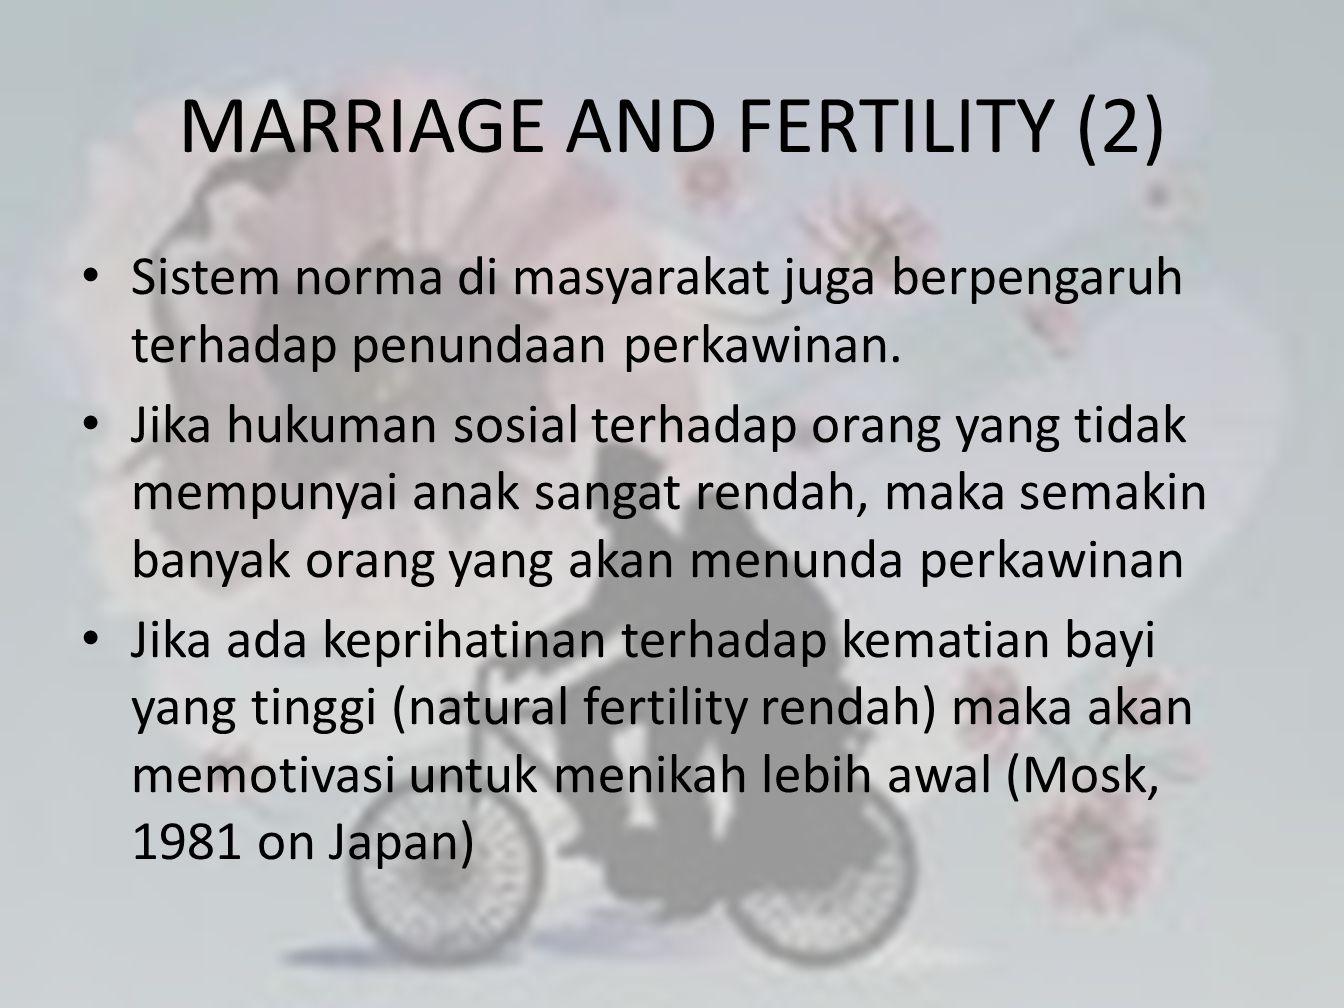 MARRIAGE AND FERTILITY (2) • Sistem norma di masyarakat juga berpengaruh terhadap penundaan perkawinan. • Jika hukuman sosial terhadap orang yang tida